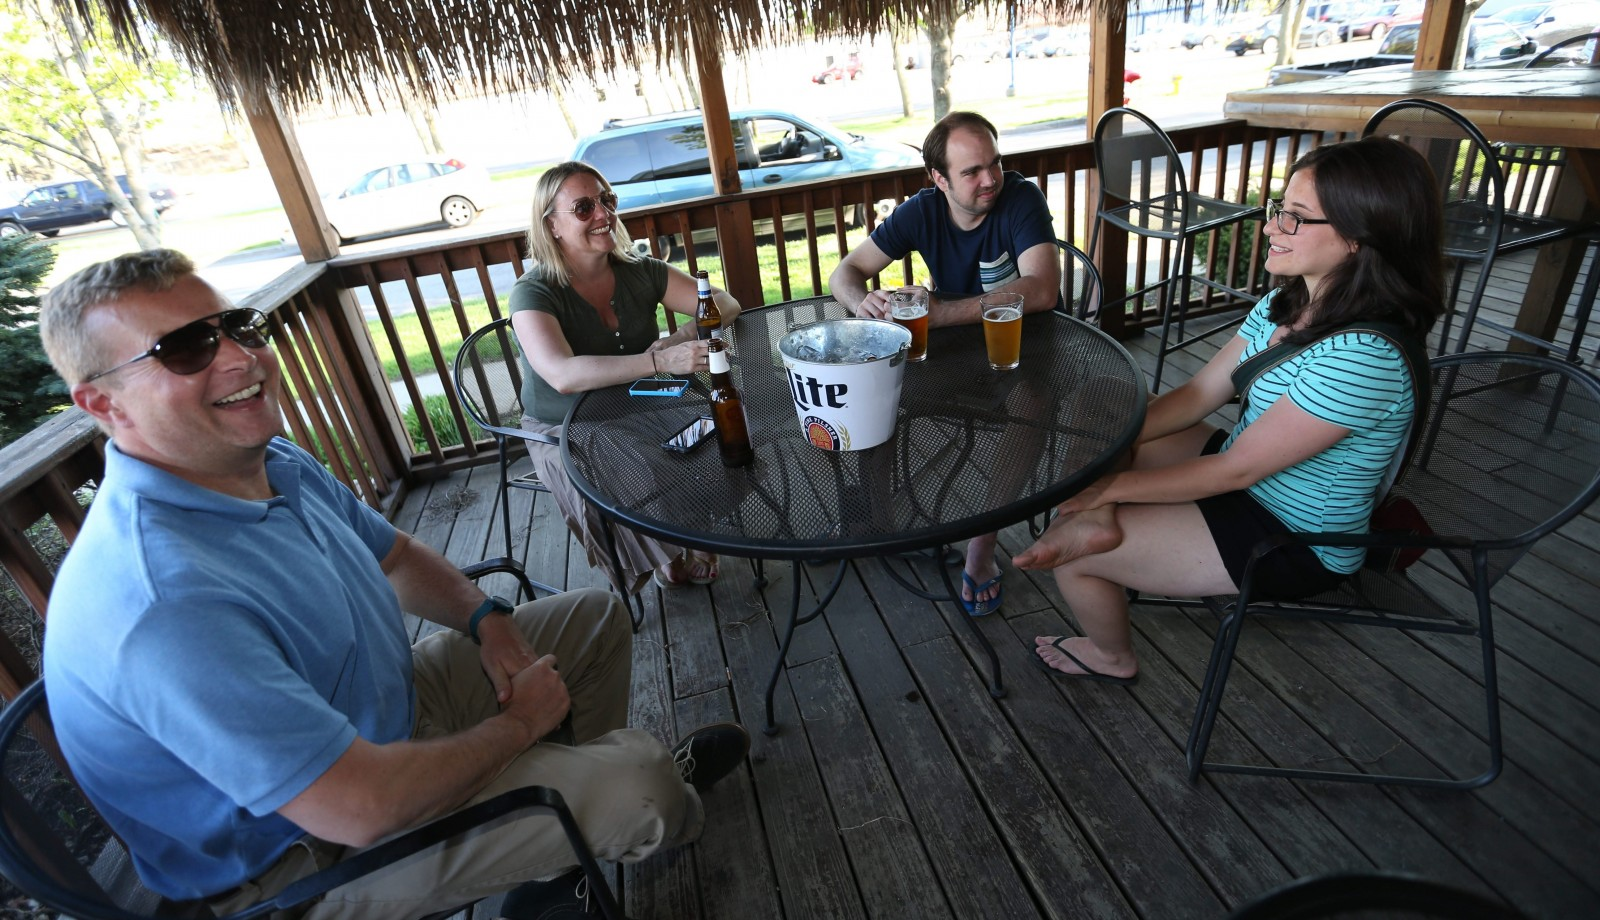 Joe Sygnatur, left, Lisa Heffle, her brother Sean Heffle and Bethany Cinelli enjoy the pleasant weather on the patio at Rafferty's Bar & Grill. (Sharon Cantillon/Buffalo News)